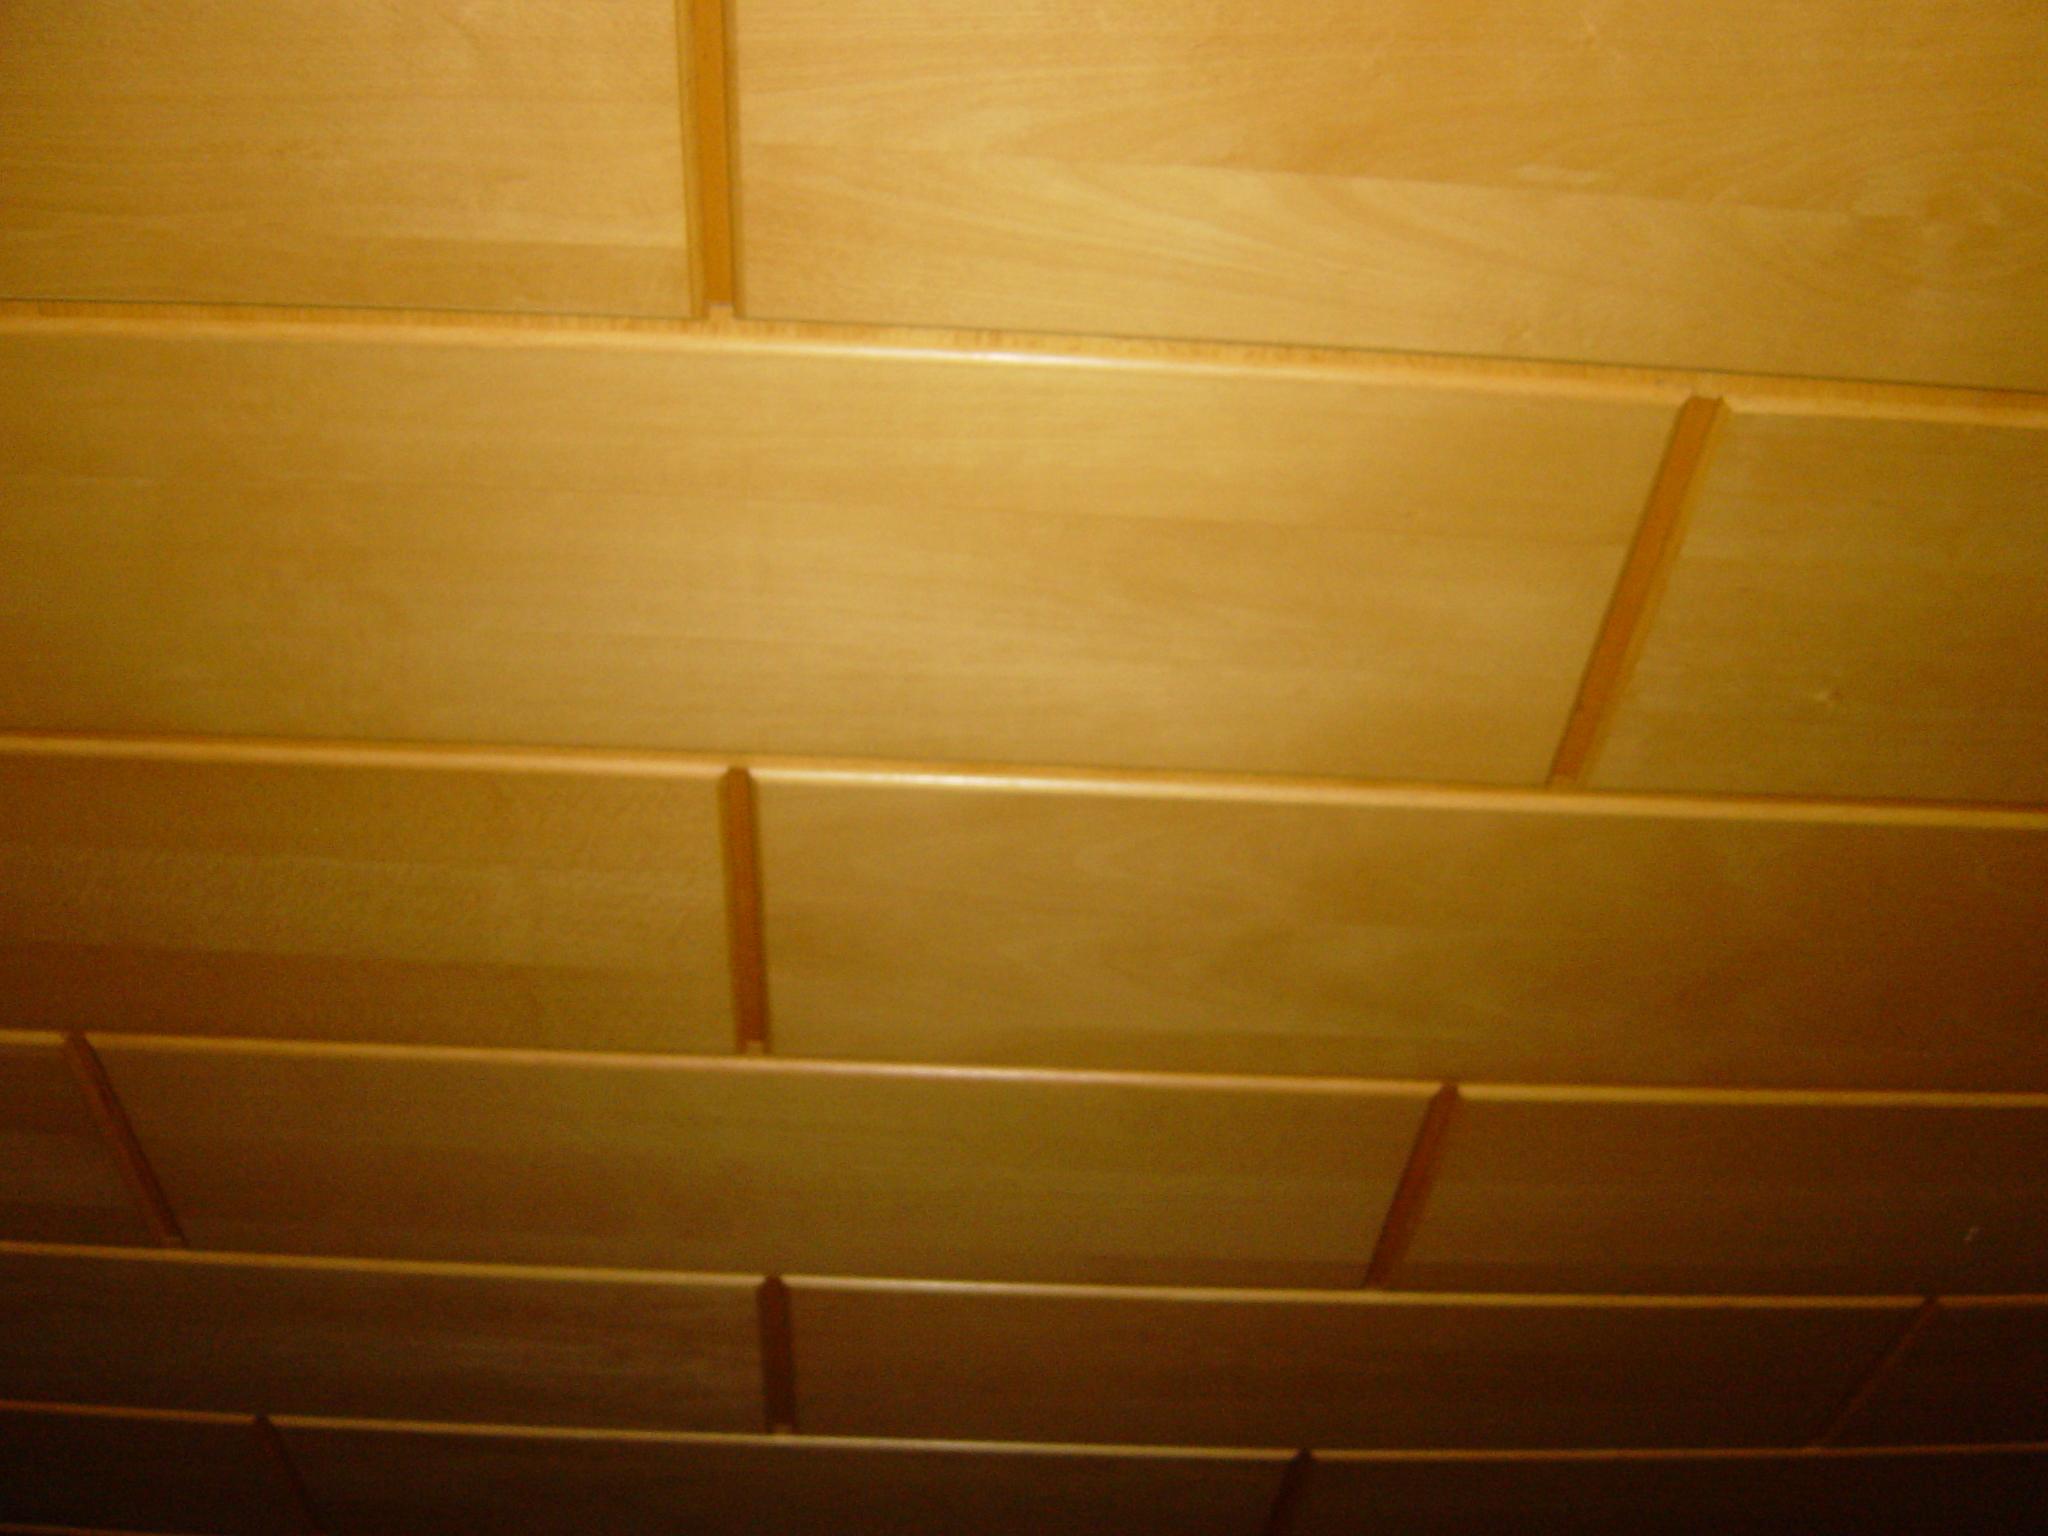 bauhaus wandpaneele wandpaneele k che bauhaus vt51 hitoiro bauhaus wandpaneele gartenger te. Black Bedroom Furniture Sets. Home Design Ideas